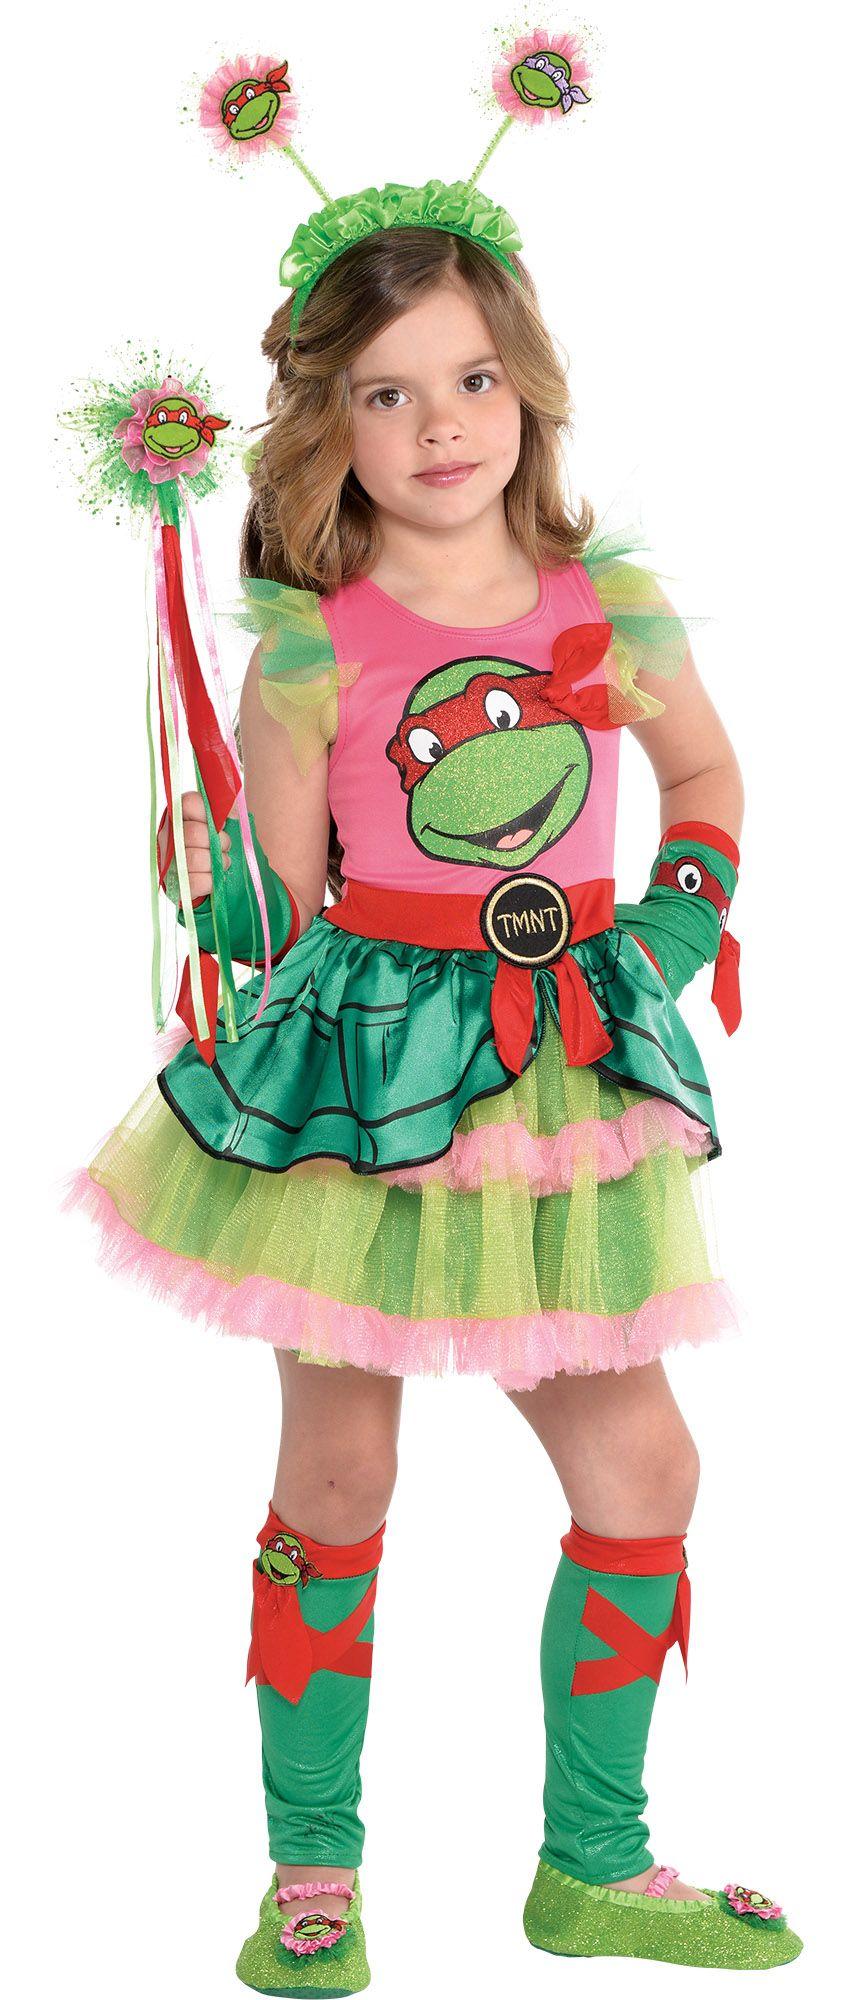 Create Your Own Look - Girl Teenage Mutant Ninja Turtle Dress #1